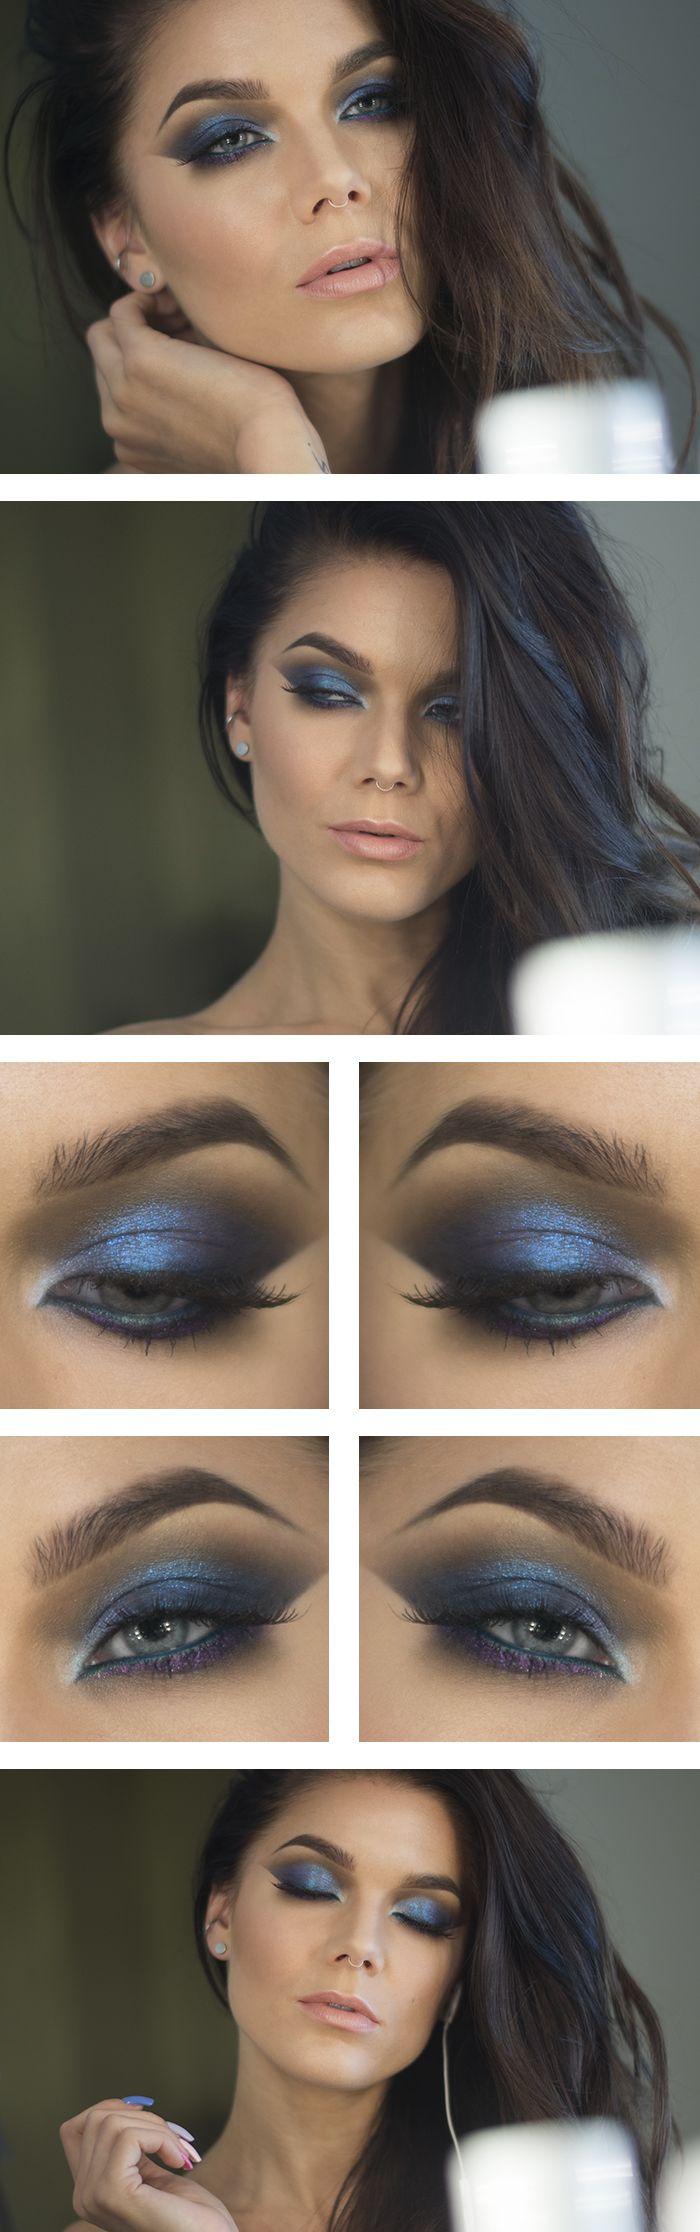 Todays look – Arabic inspired eyes